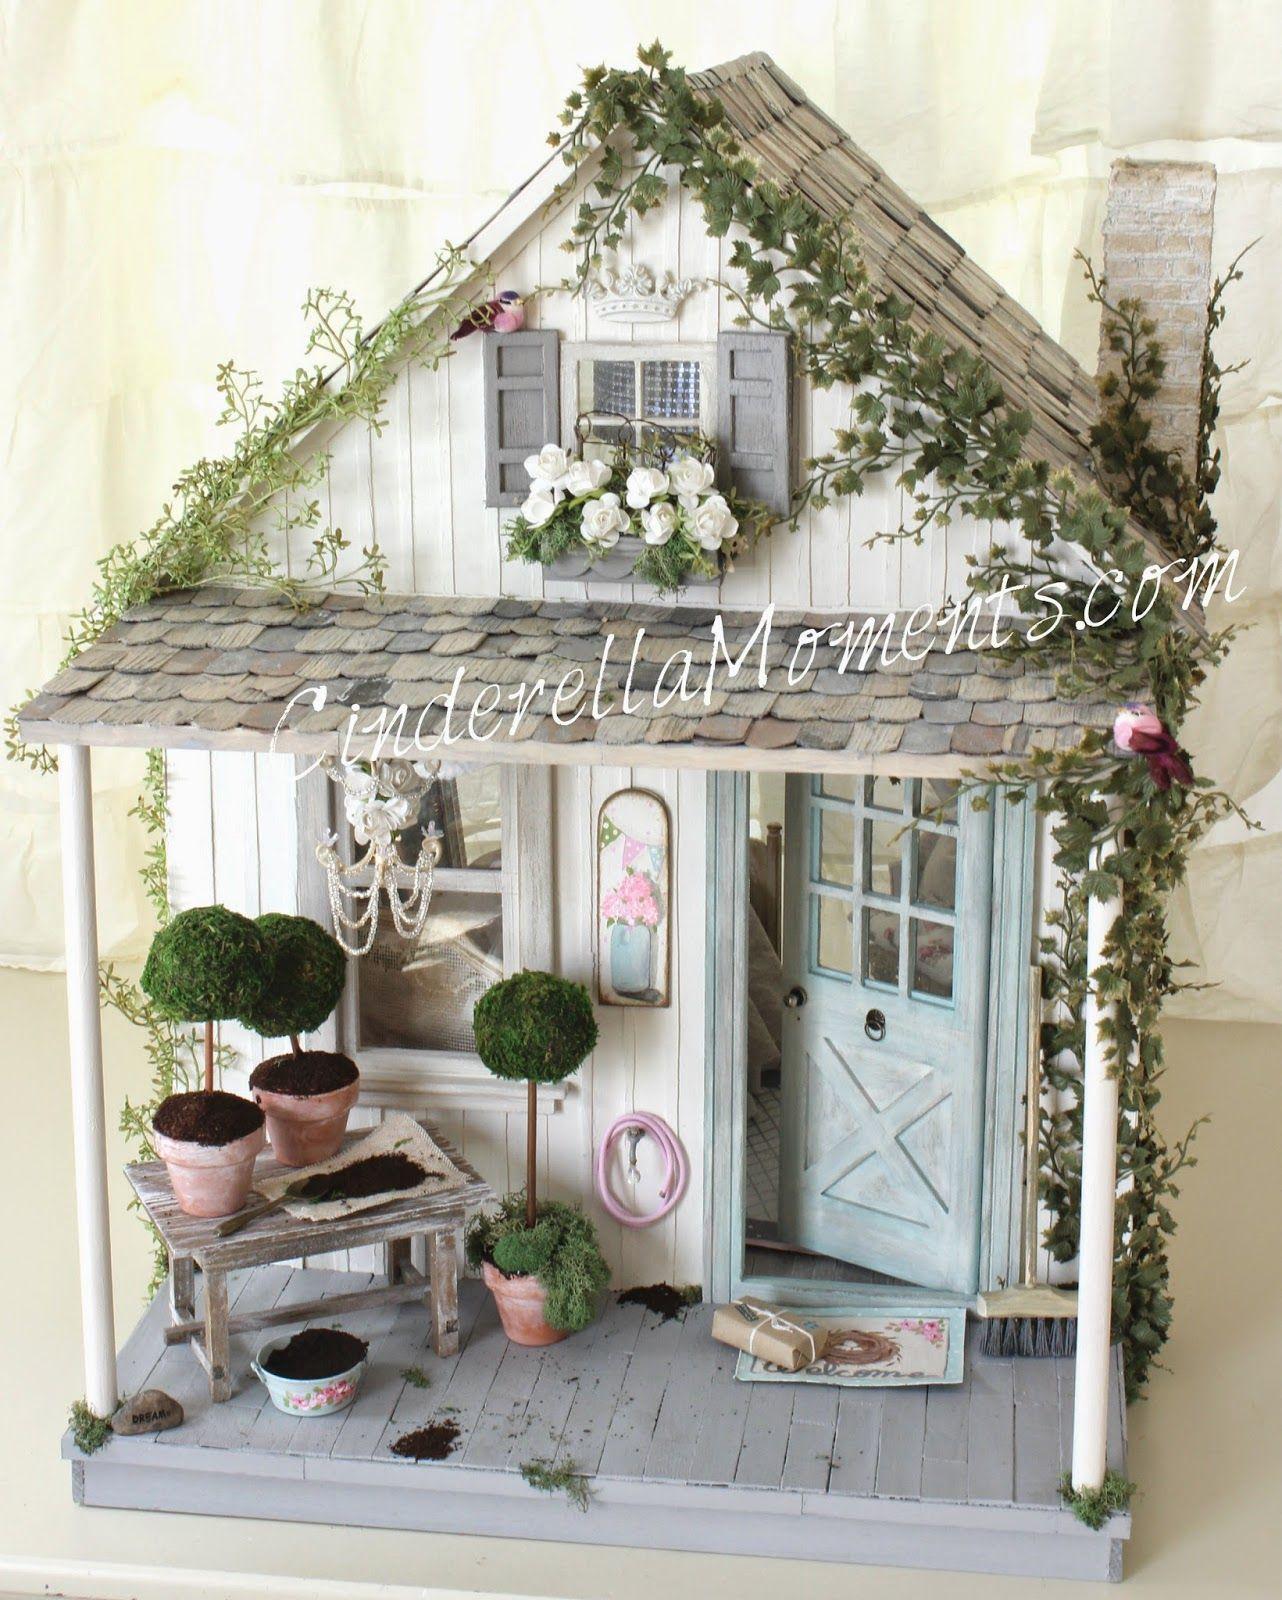 cinderella moments shabby blythe custom dollhouse crafting diy pinterest puppenstube. Black Bedroom Furniture Sets. Home Design Ideas